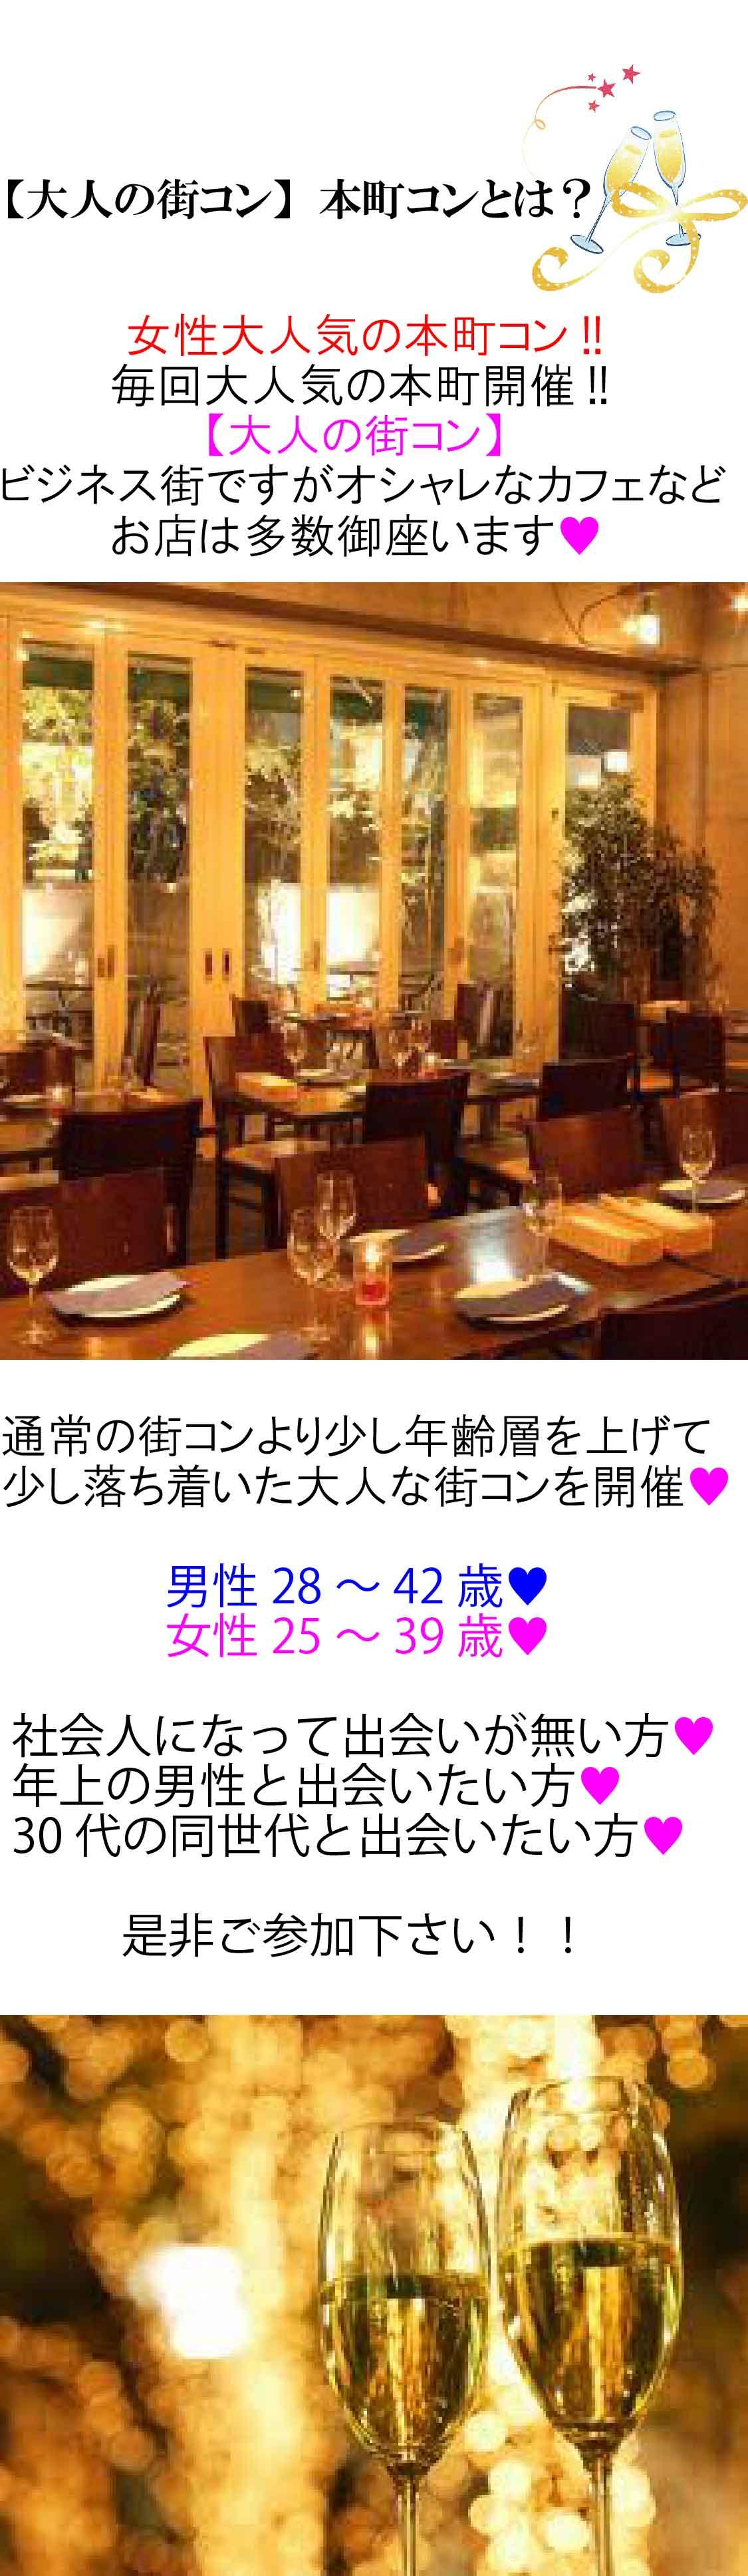 改良3 new3 honmachi-otomachi-point